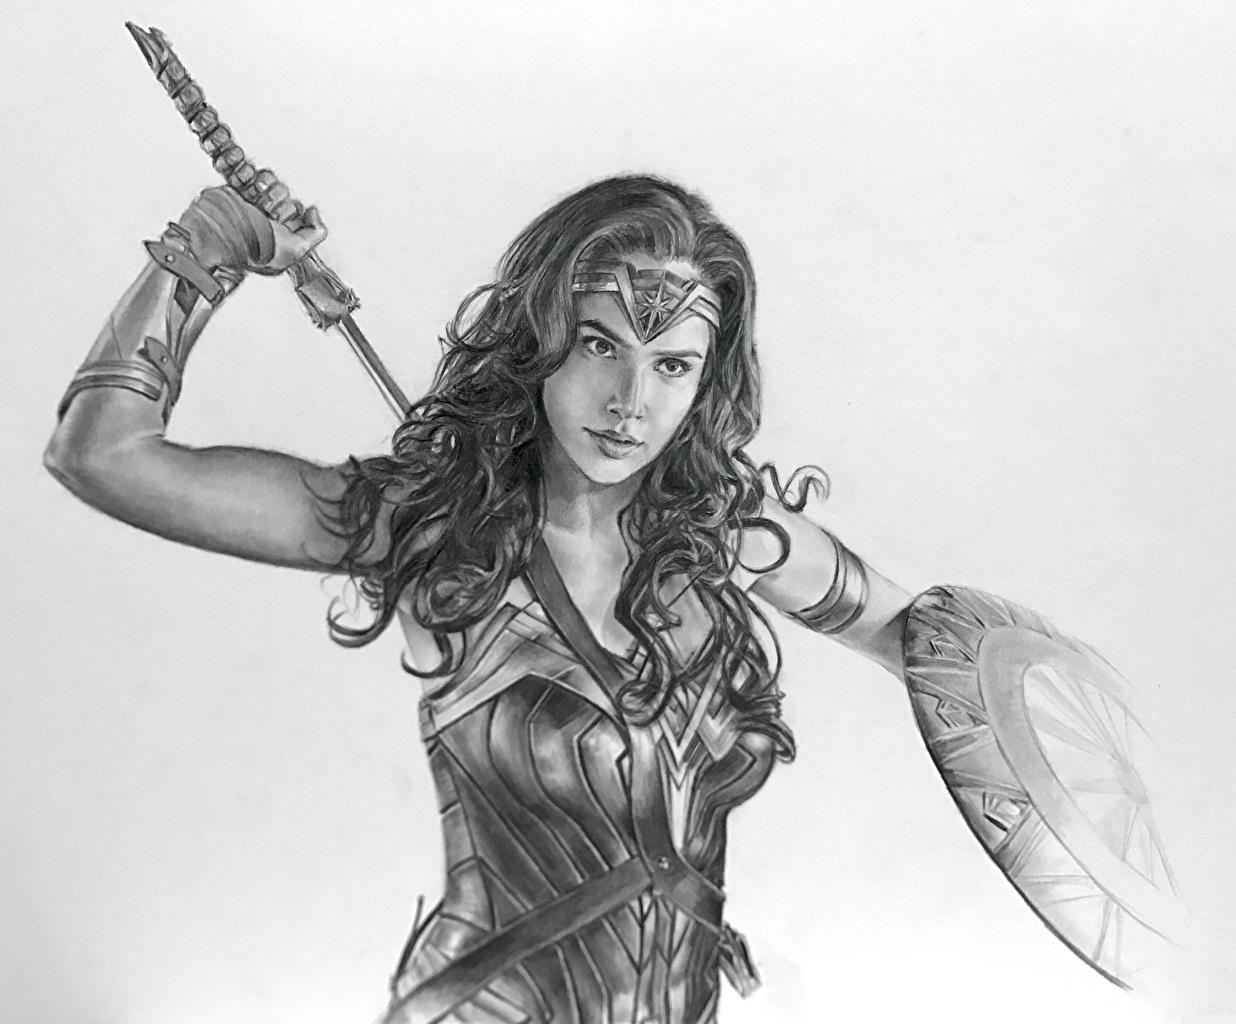 Image Wonder Woman (2017 film) Gal Gadot Shield Wonder Woman hero warrior female film Black and white Celebrities Painting Art Warriors Girls young woman Movies